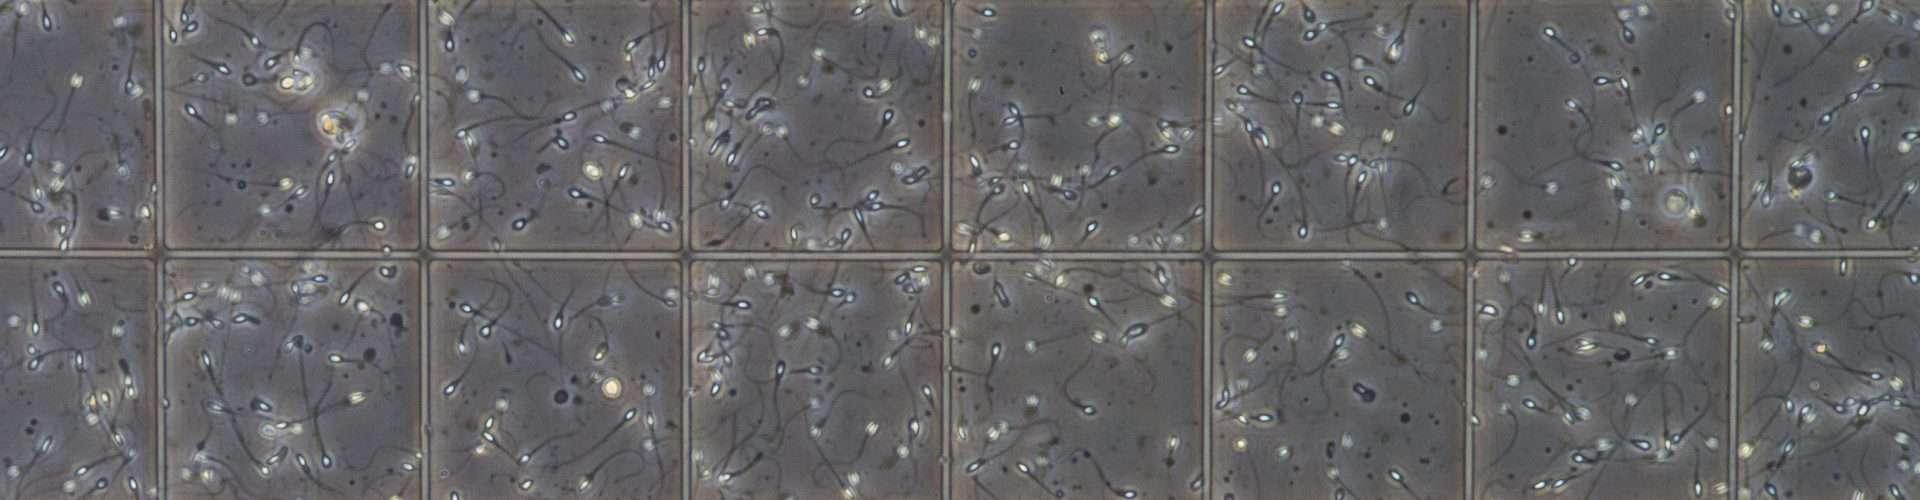 Infertilidad masculina: ¿cómo afecta la soja sobre la calidad del esperma?